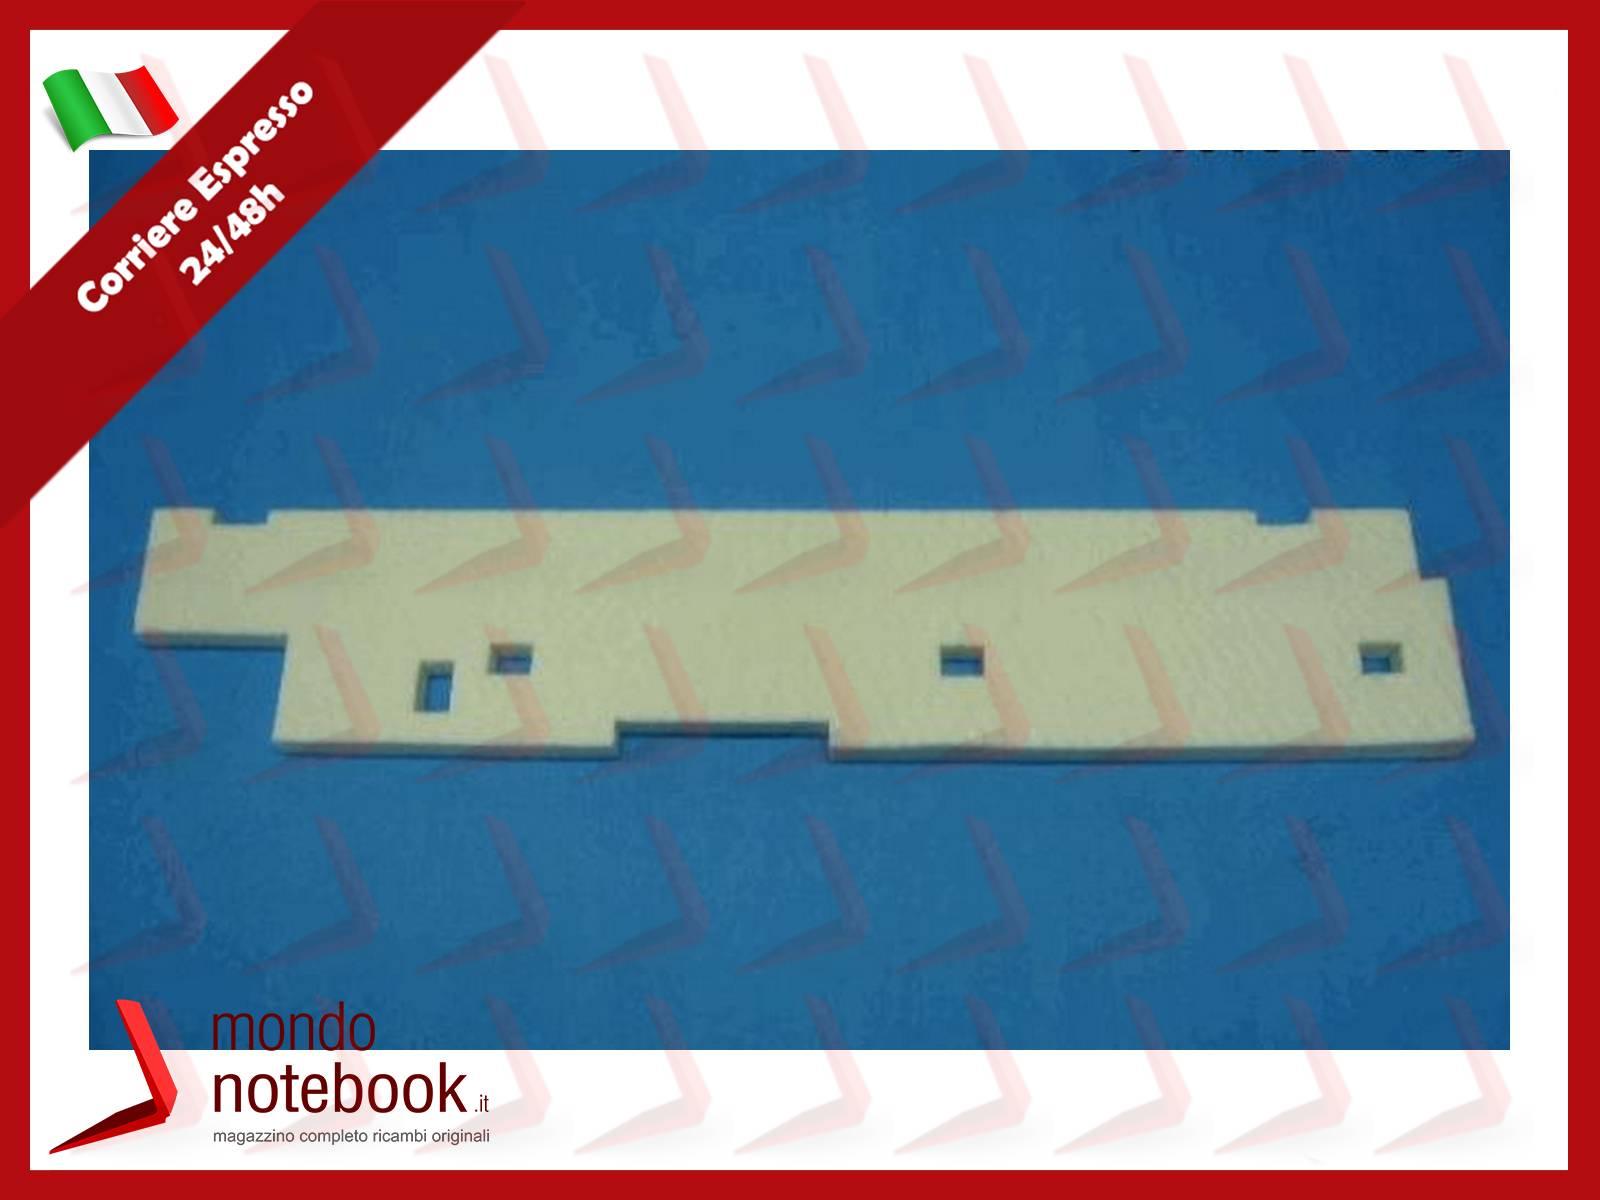 https://www.mondonotebook.it/17697/connettore-di-alimentazione-dc-power-jack-hp-430-g5-440-g5-450-g5-470-g5-8-pin.jpg